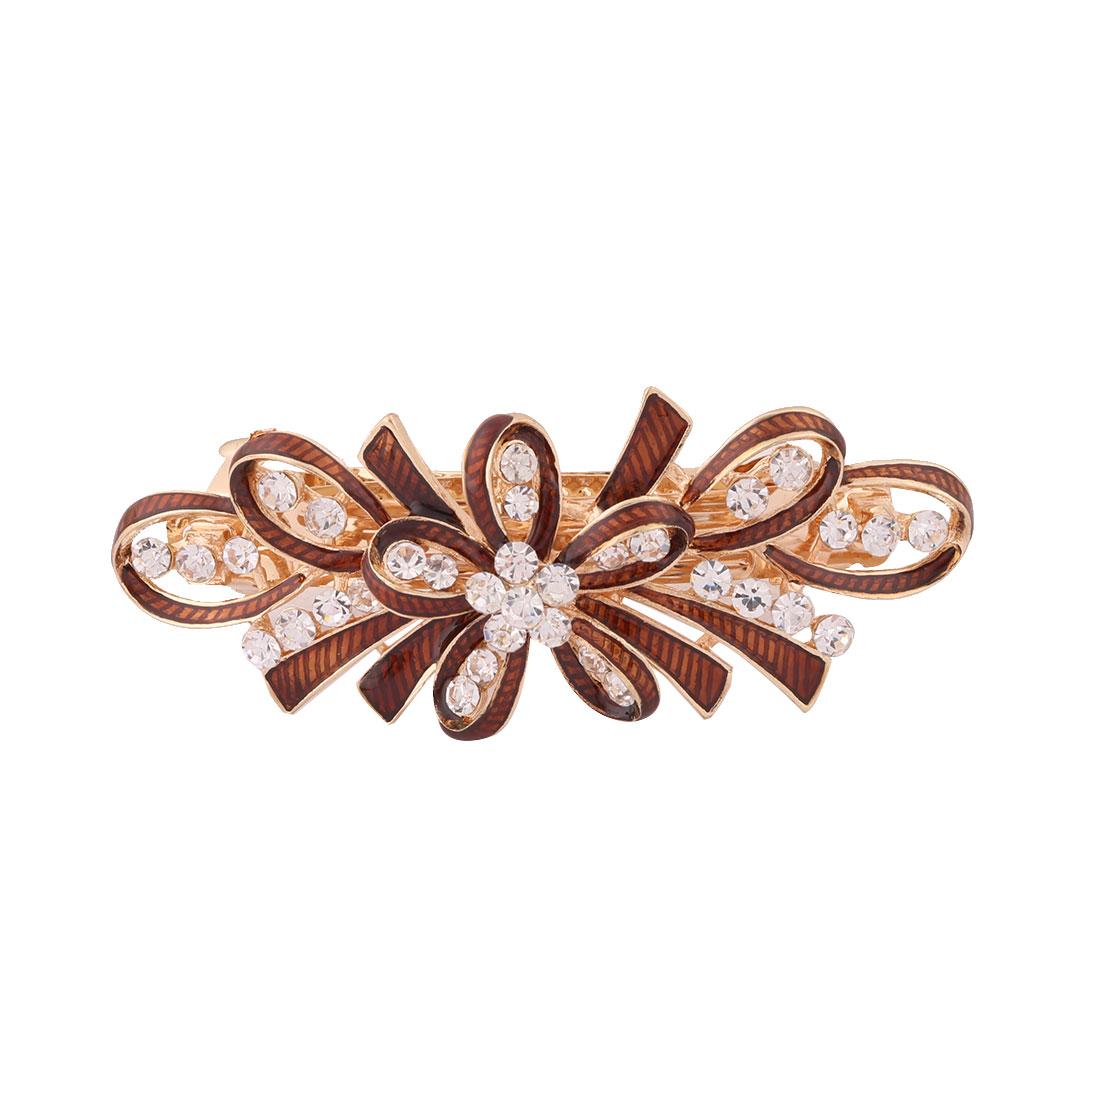 Metal Bowknot Design Faux Rhinestones Inlaid Hairwearing Hair Clip Coffee Color